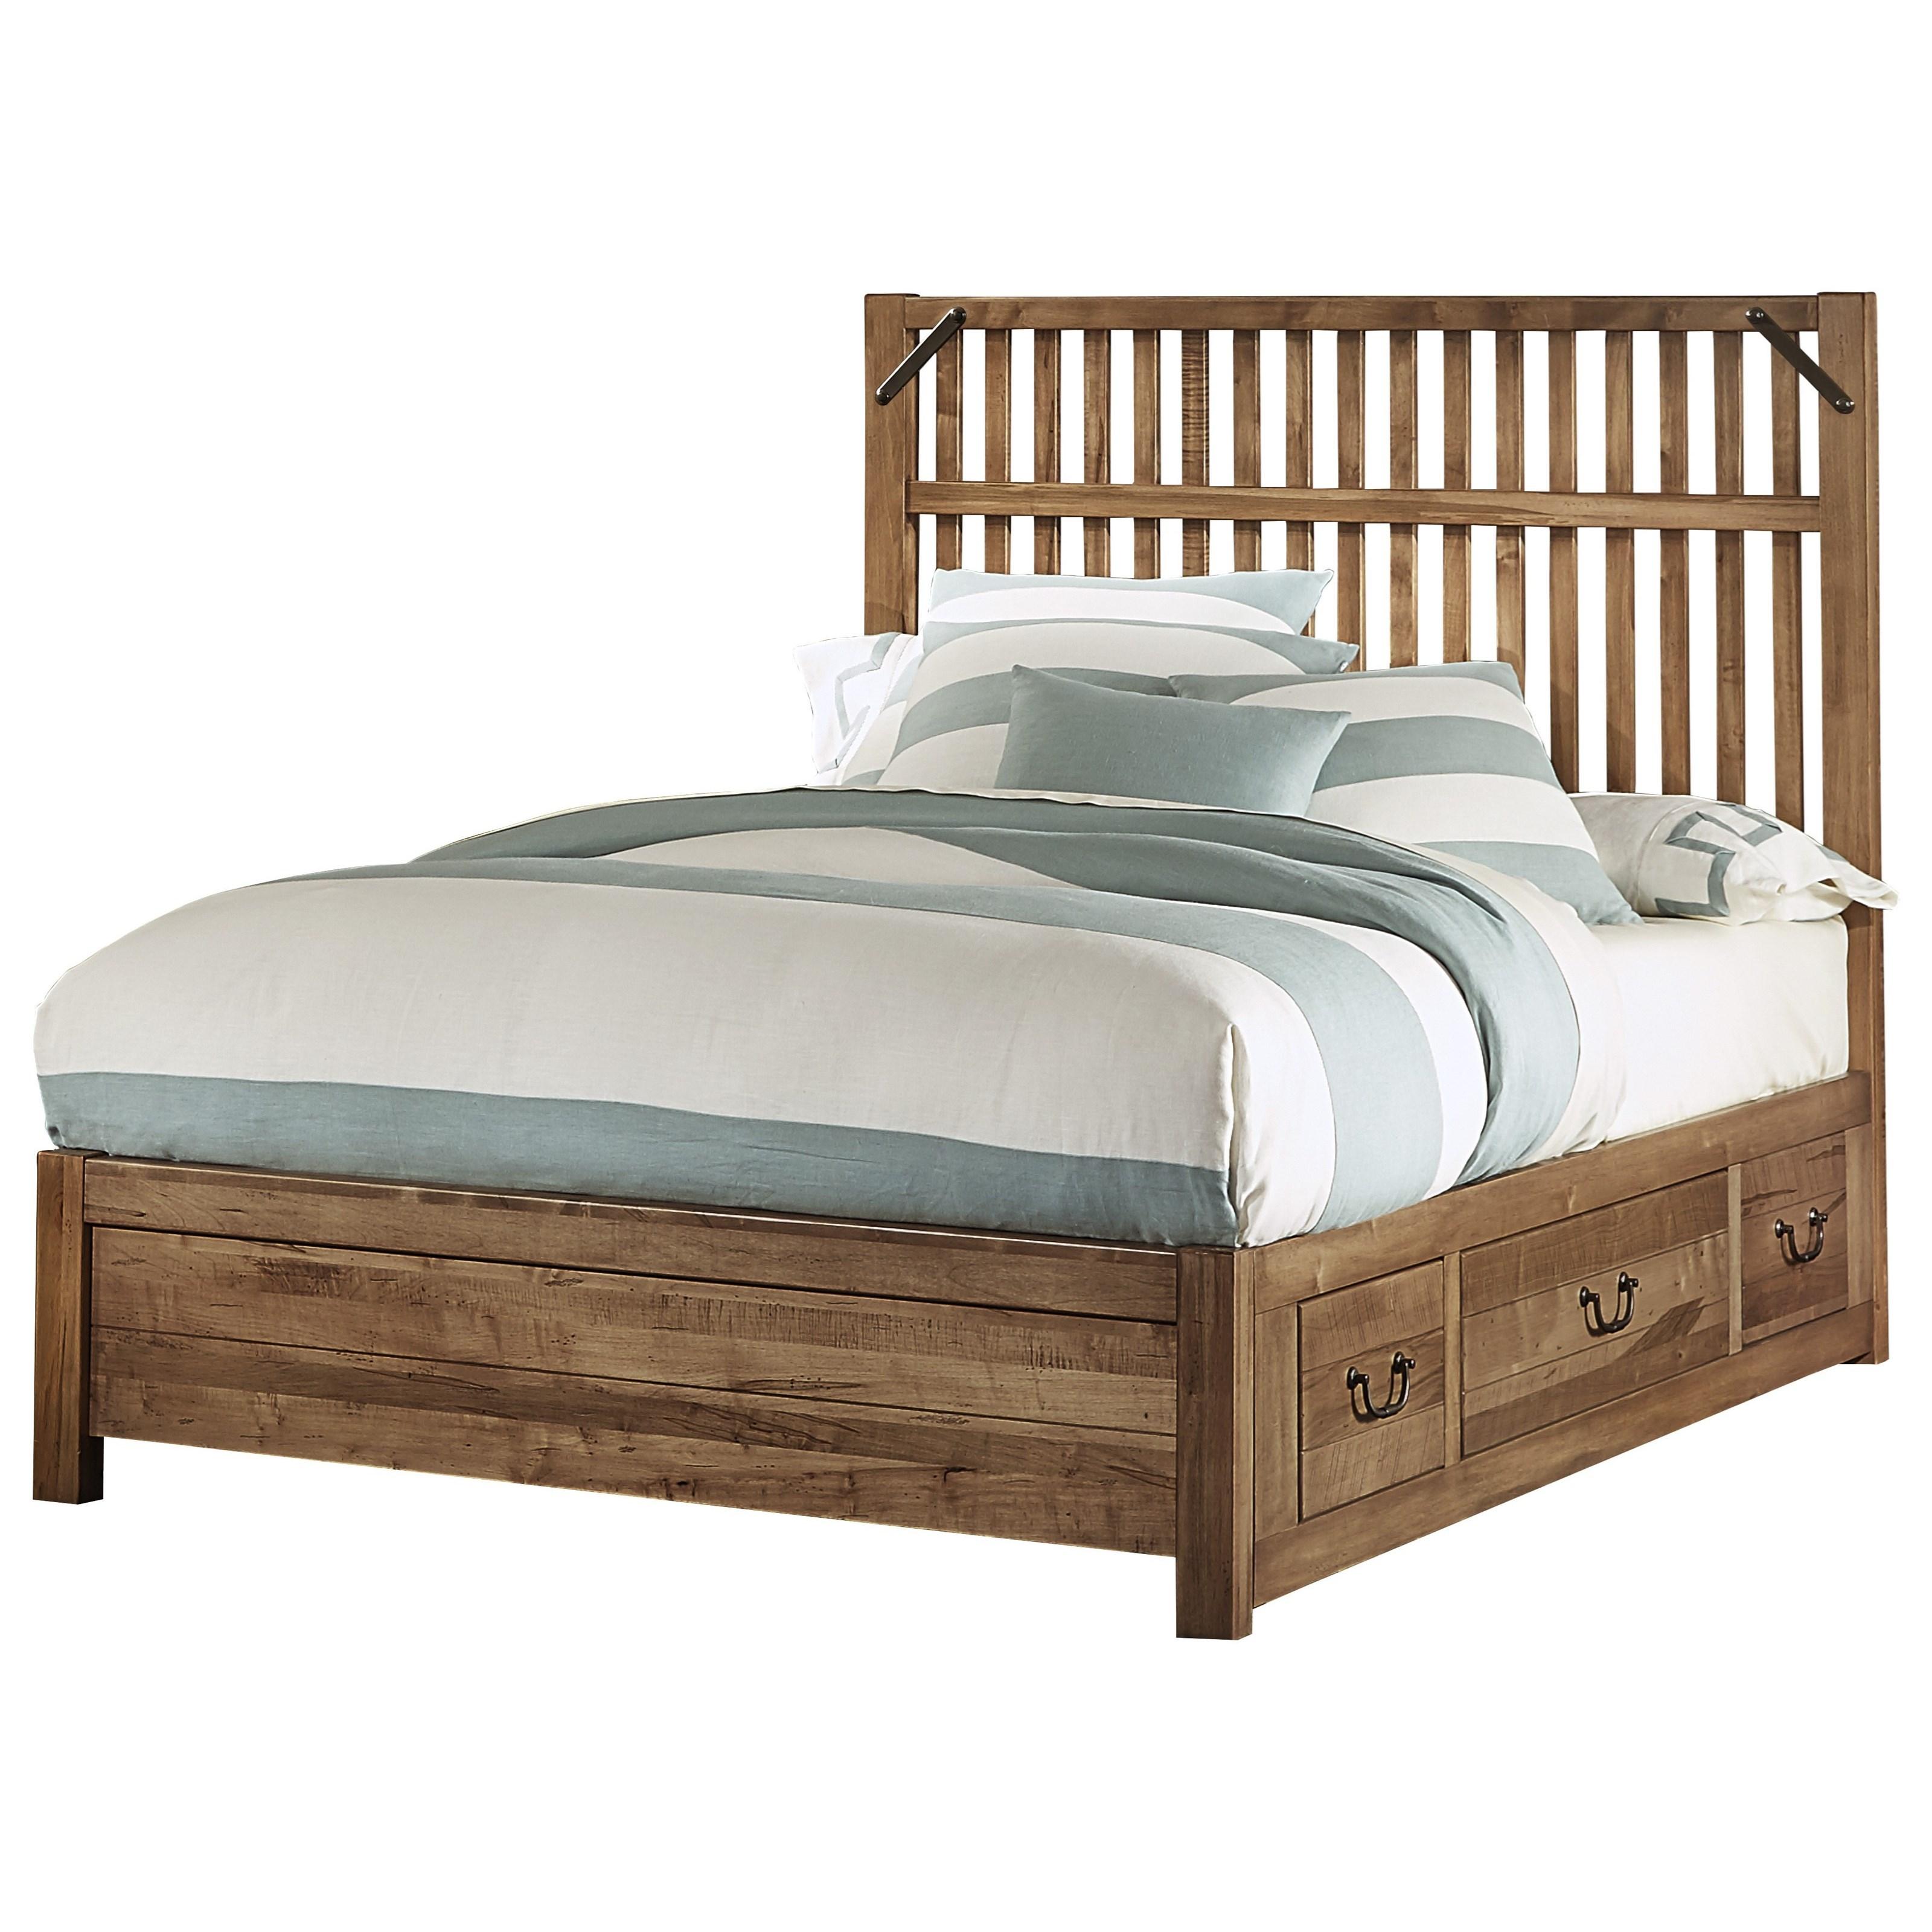 artisan post sedgwick rustic queen slat bed with 6 side storage drawers belfort furniture. Black Bedroom Furniture Sets. Home Design Ideas